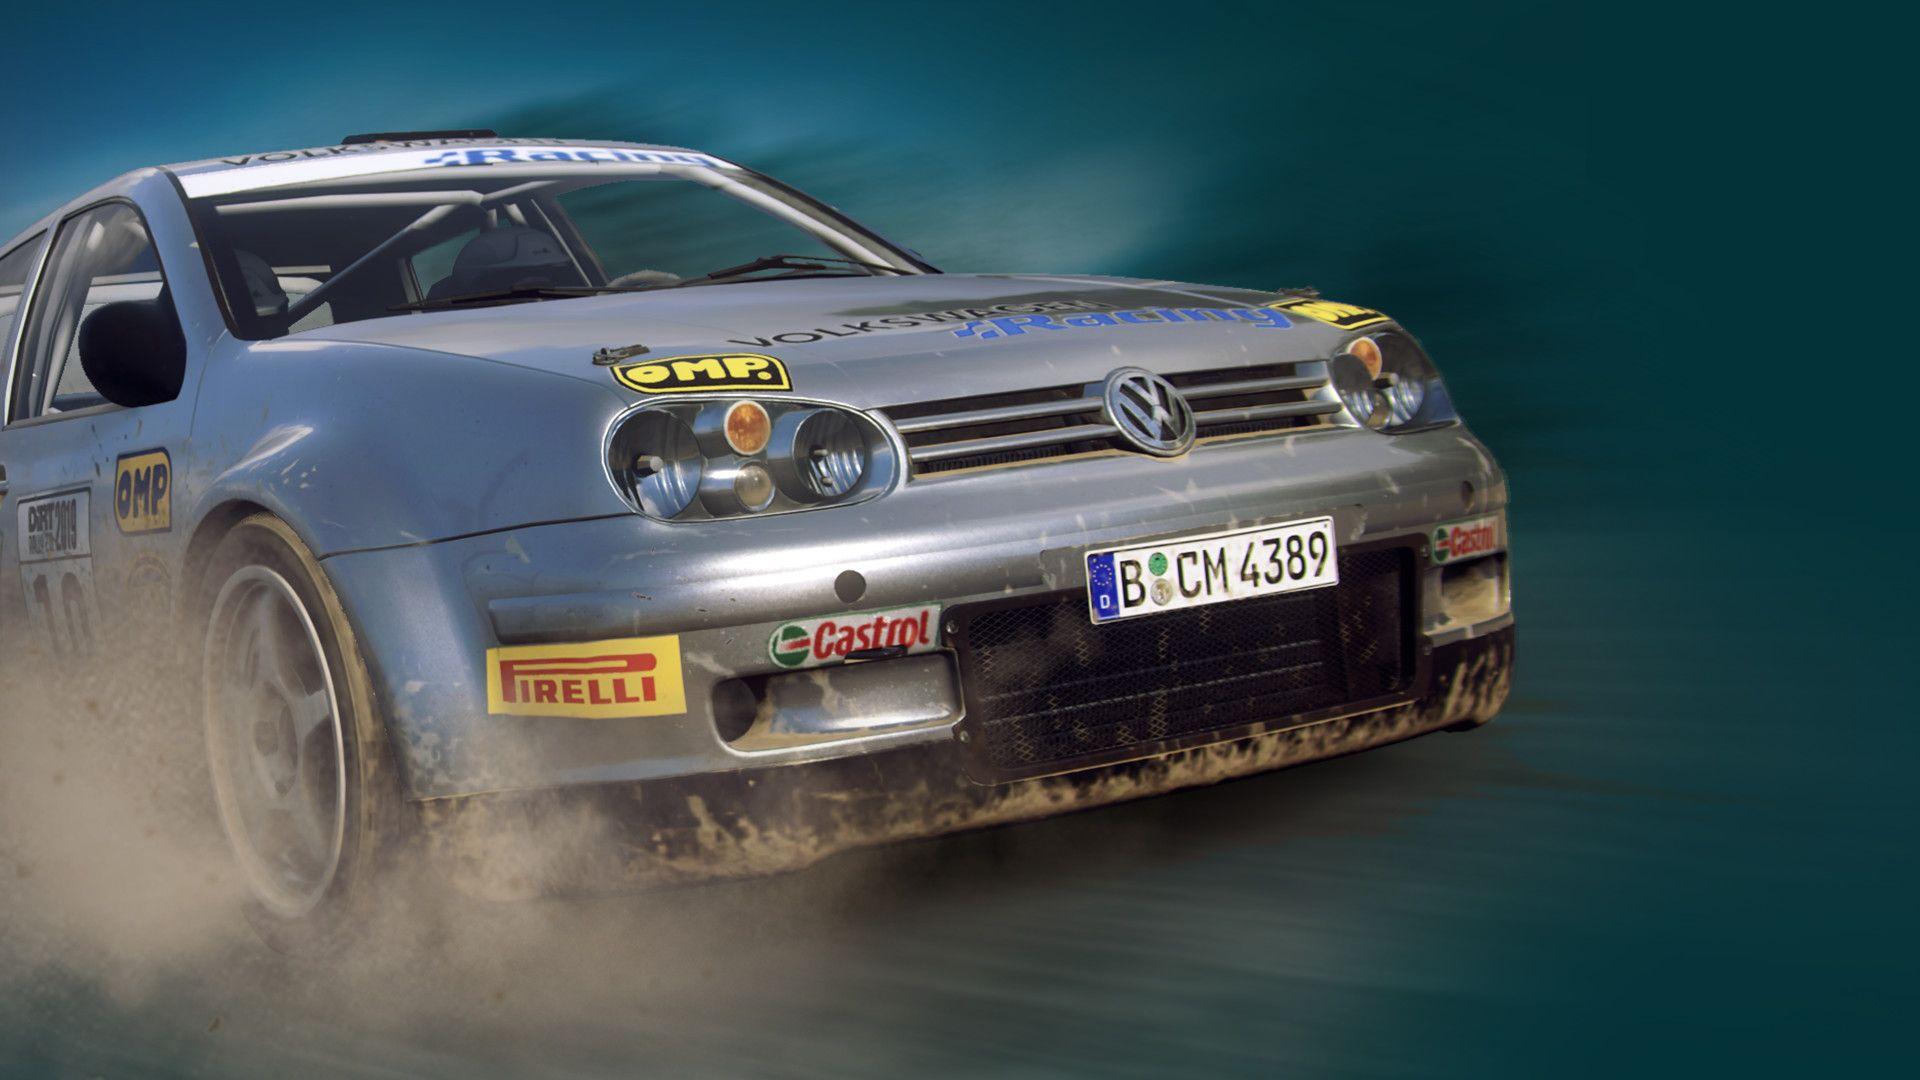 DiRT Rally 2.0 - Volkswagen Golf Kitcar